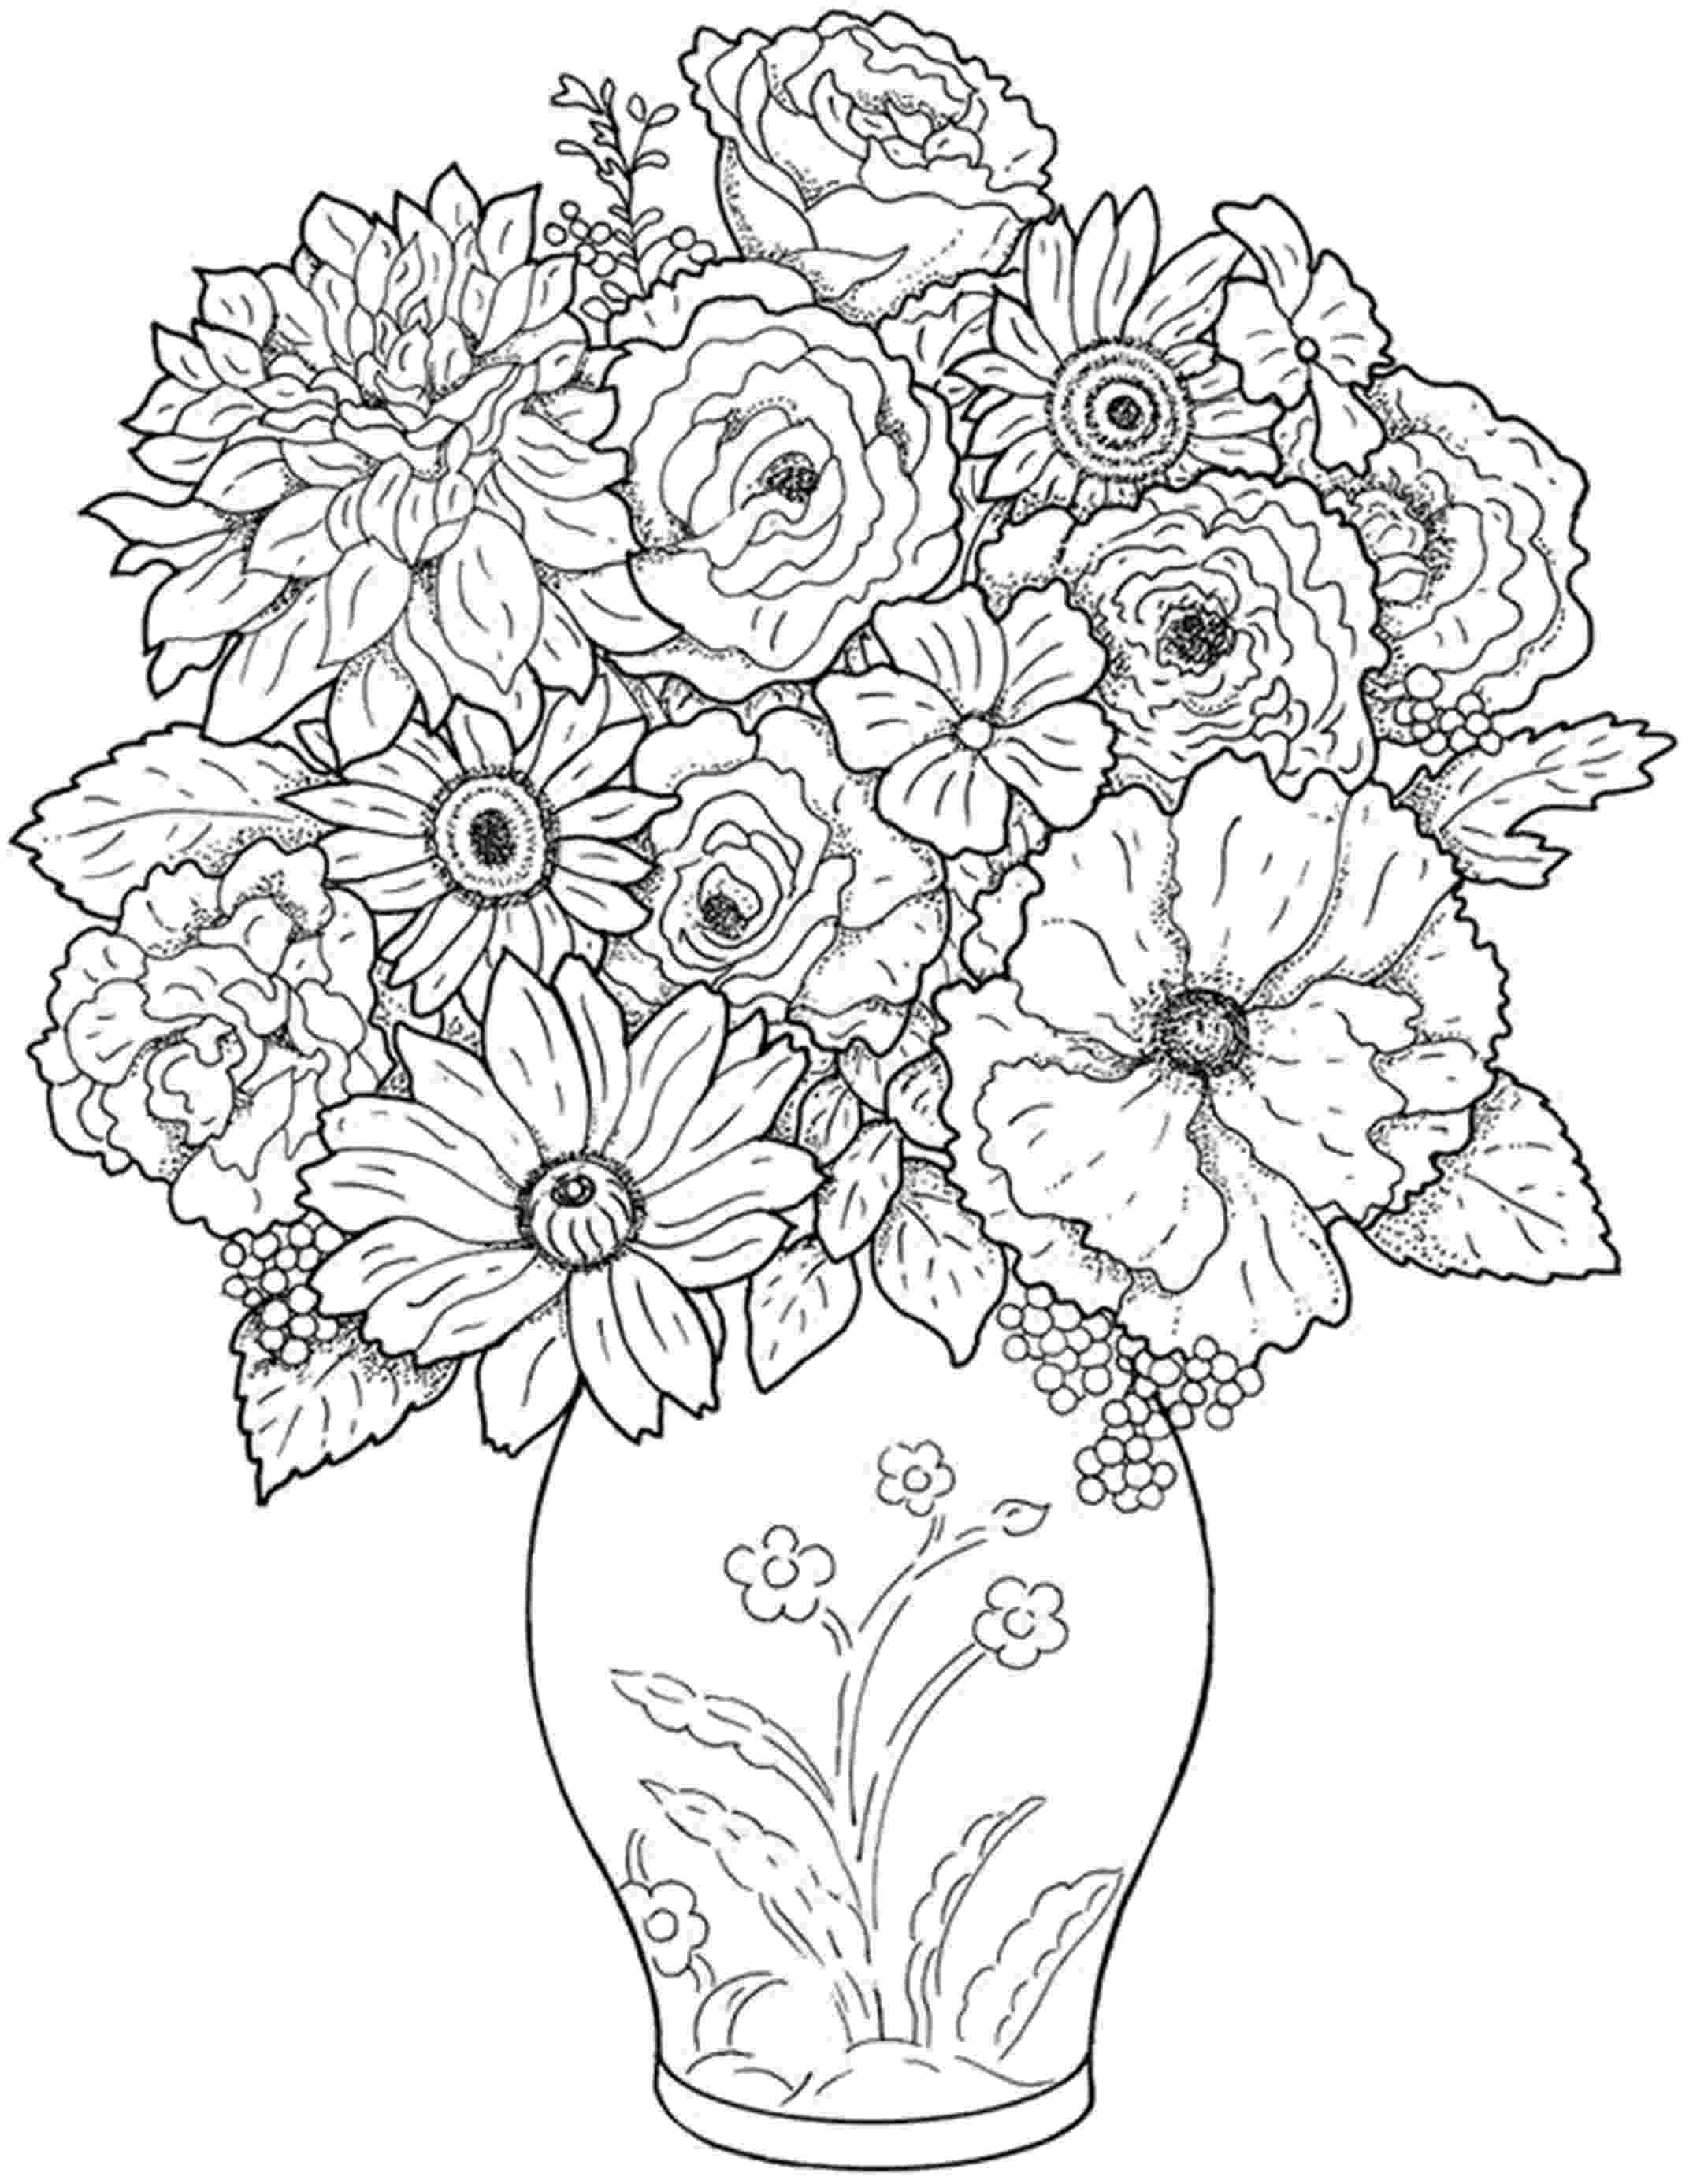 floral designs coloring book paisley coloring pages getcoloringpagescom book floral designs coloring